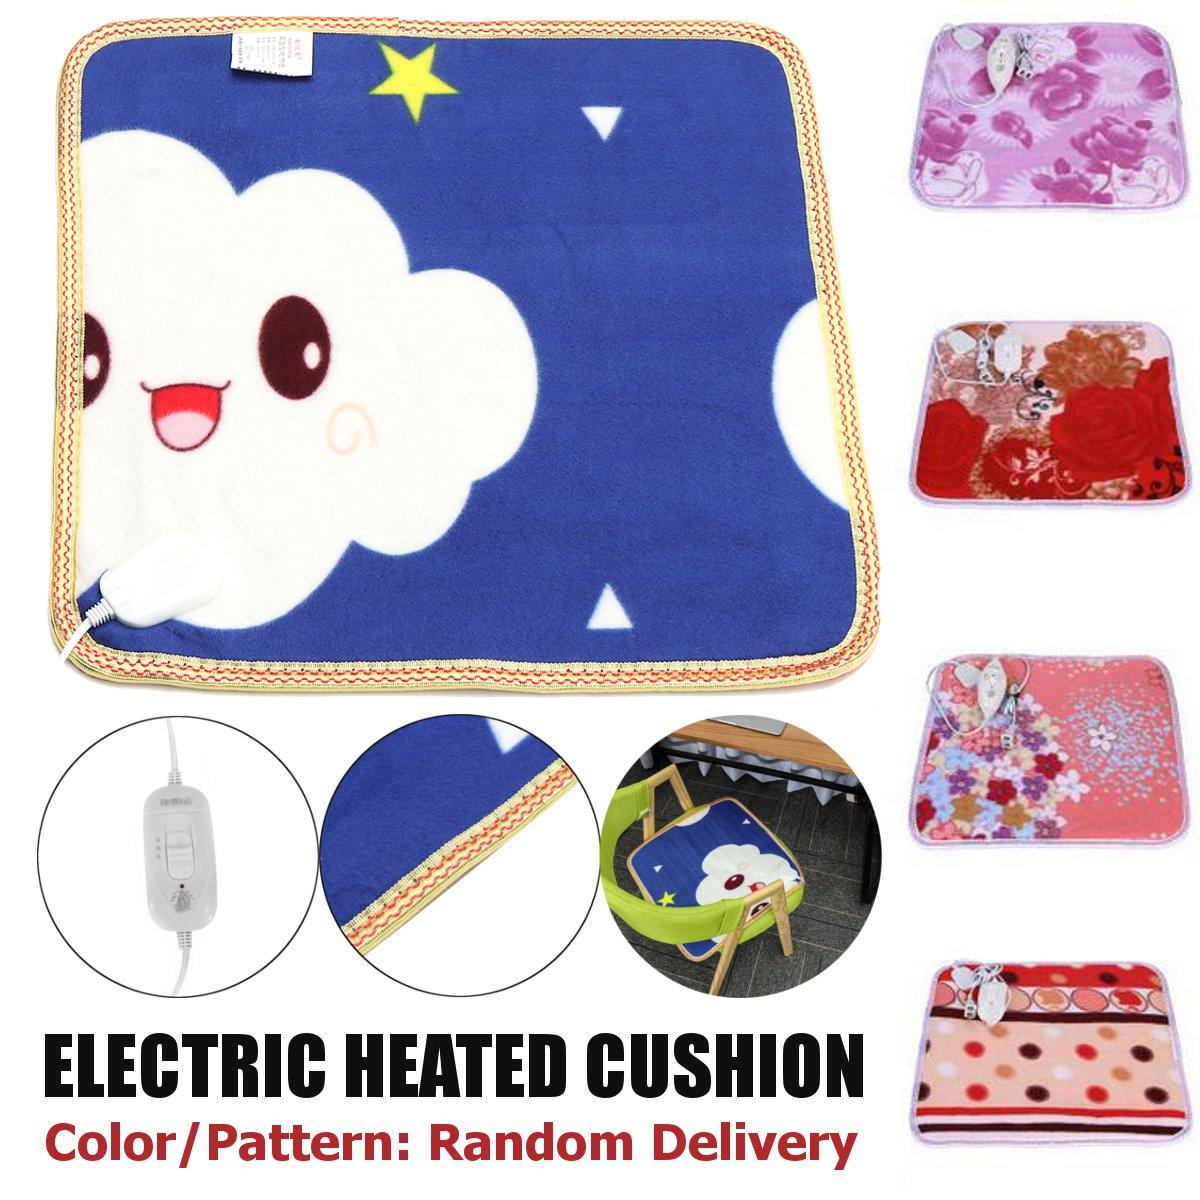 50W 220V Electric Heating Pad Blanket Heated Seat Cushion Mat Winter Chair Warmer Office Home Sofa Mat Patterns Random 45x45cm